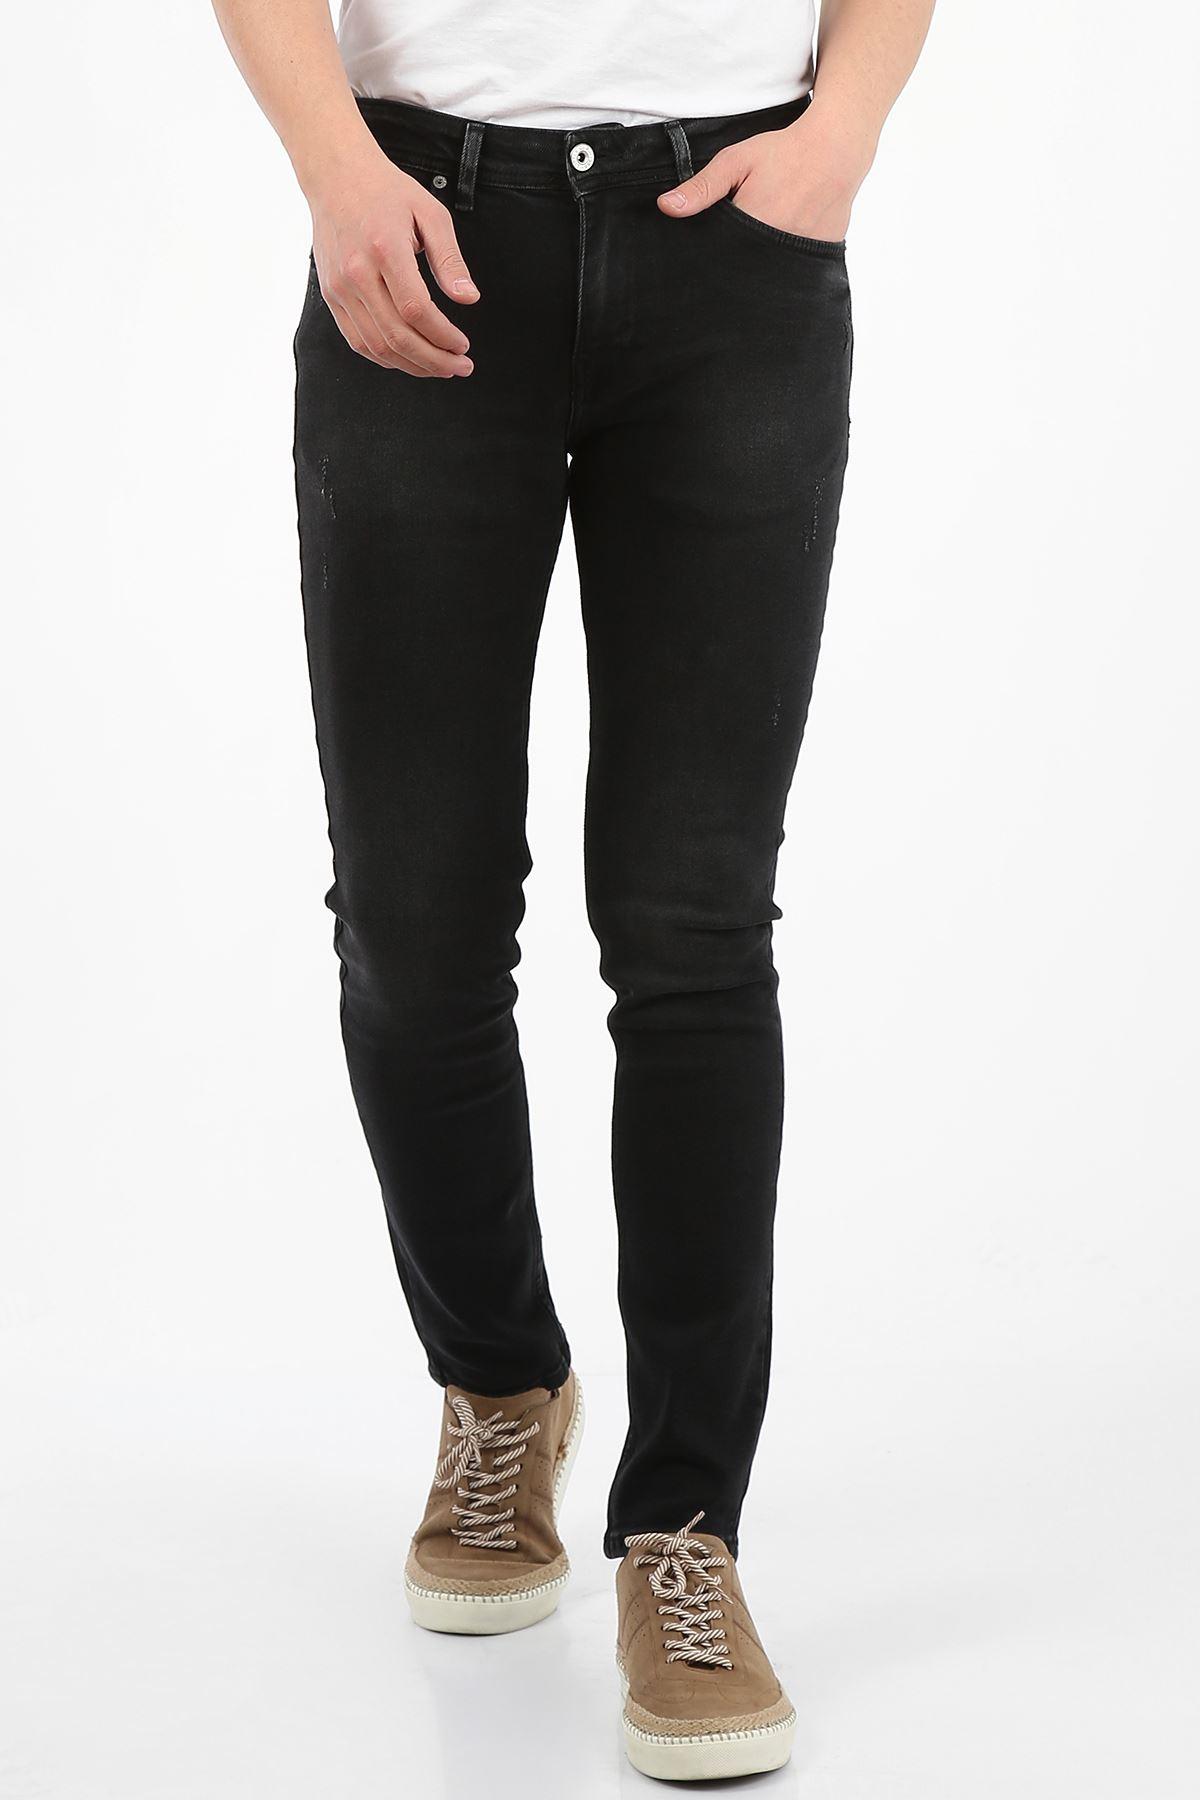 Siyah Yıpratma Slim Fit Fermuarlı Erkek Jeans Pantolon-JONAS